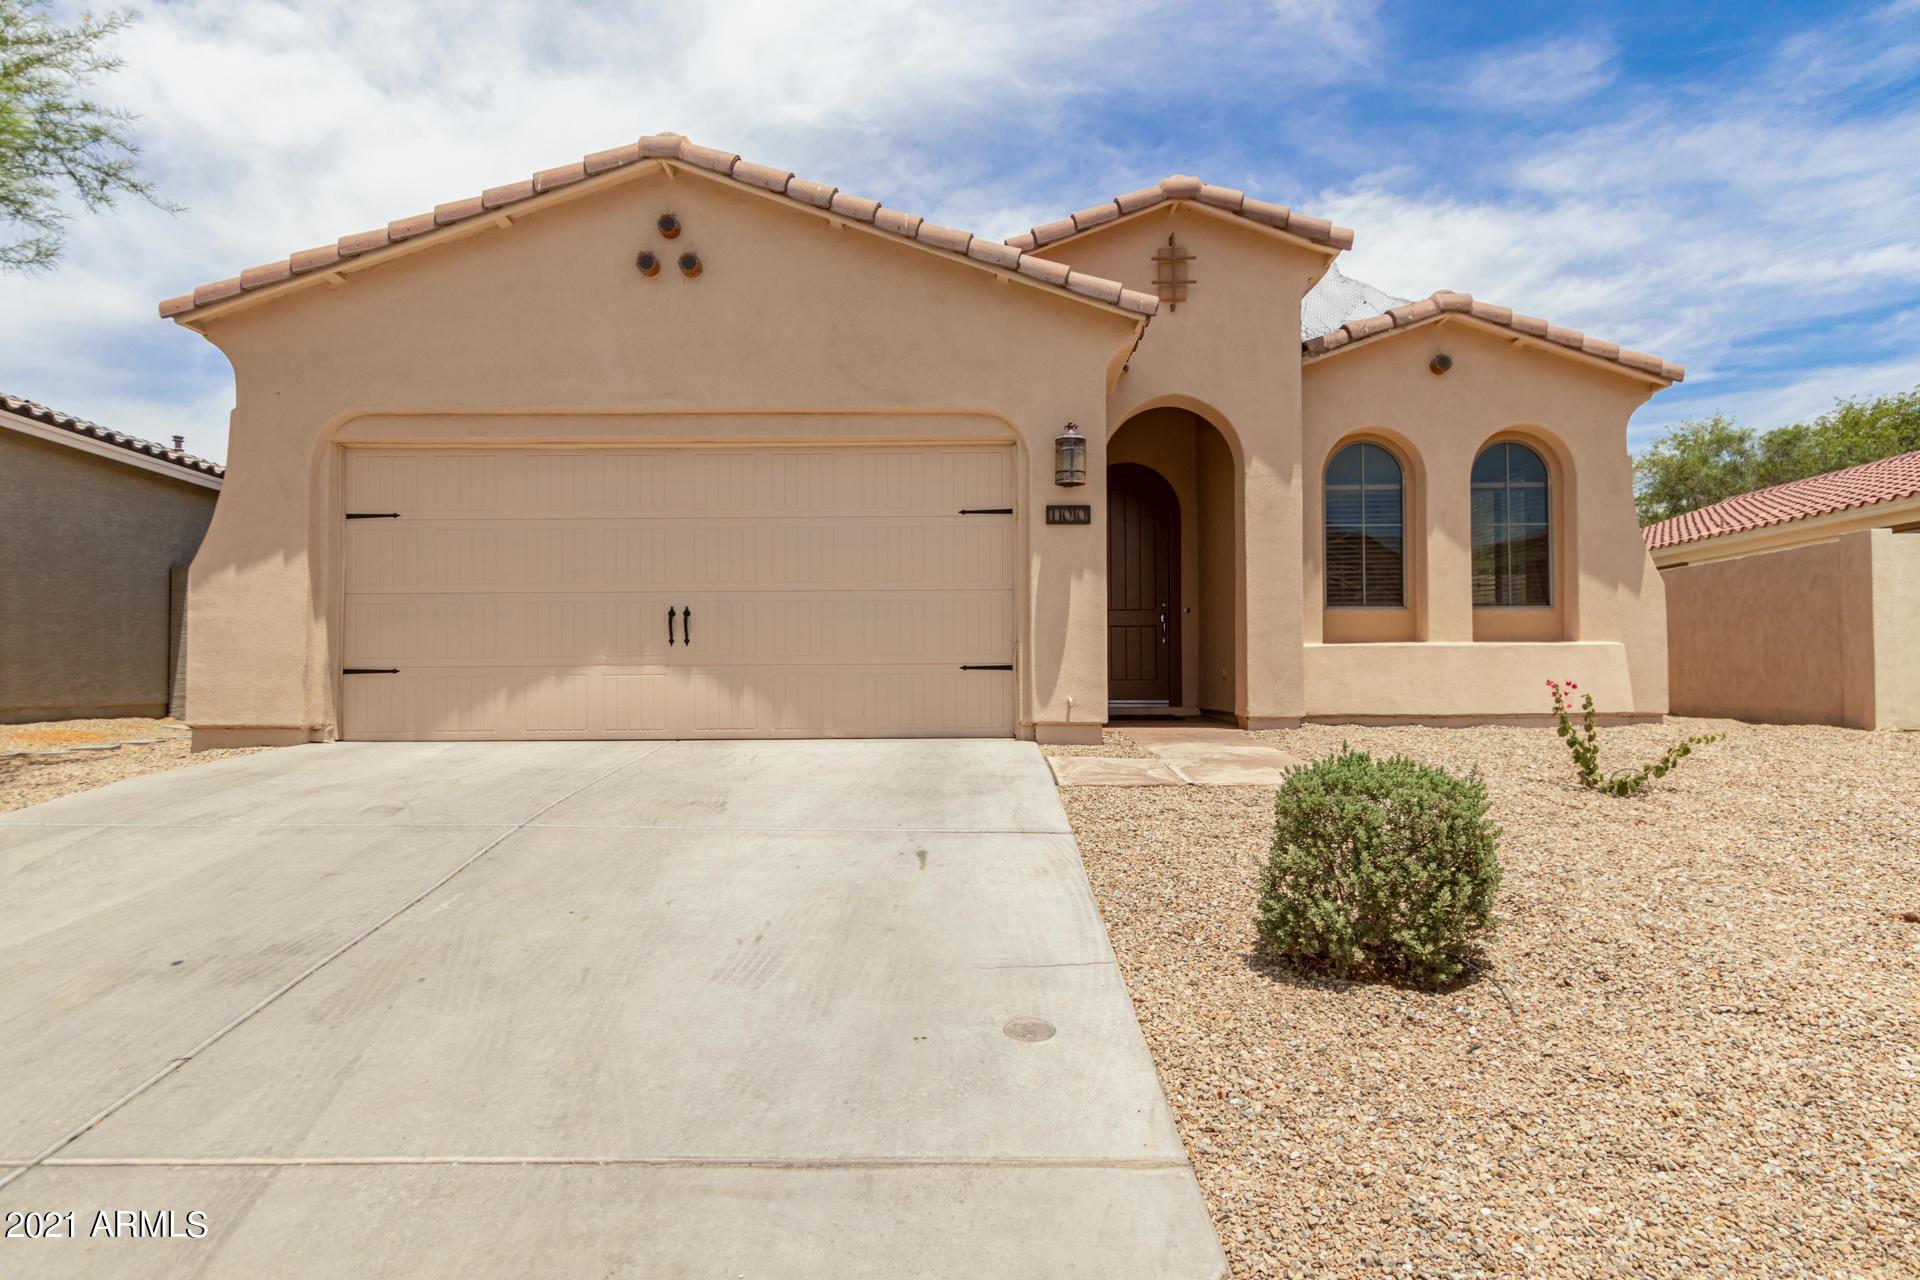 Photo of 11010 W WOODLAND Avenue, Avondale, AZ 85323 (MLS # 6248333)